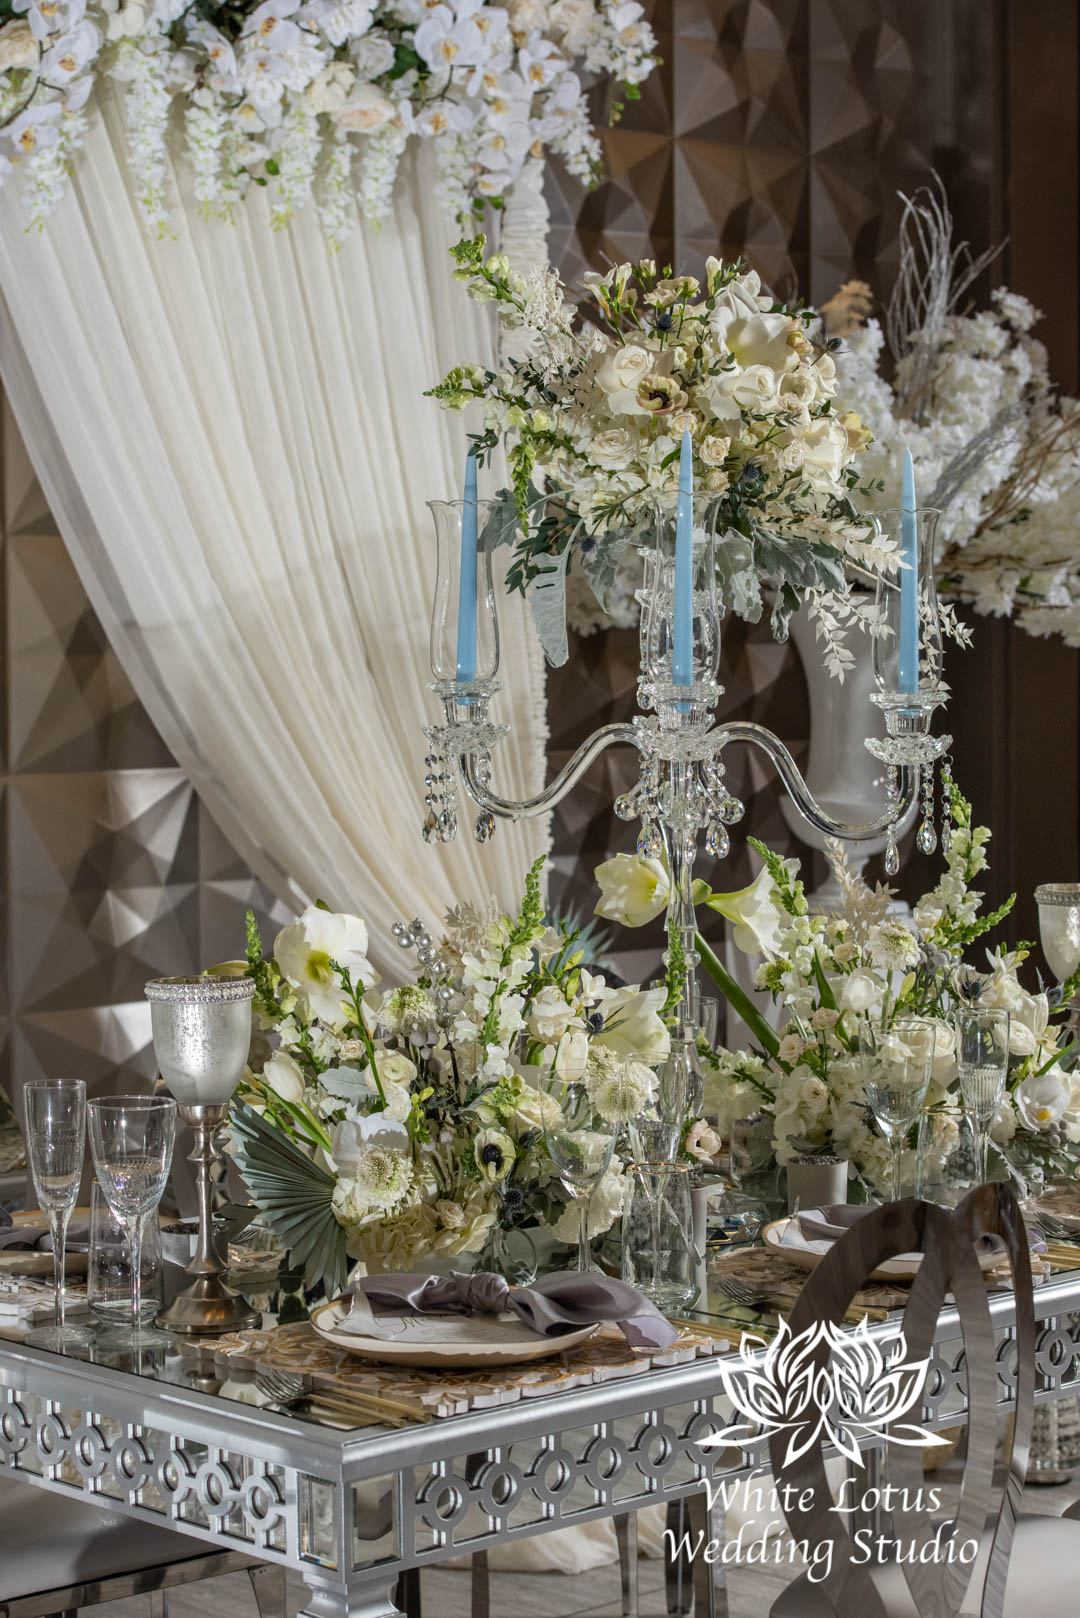 163- GLAM WINTERLUXE WEDDING INSPIRATION